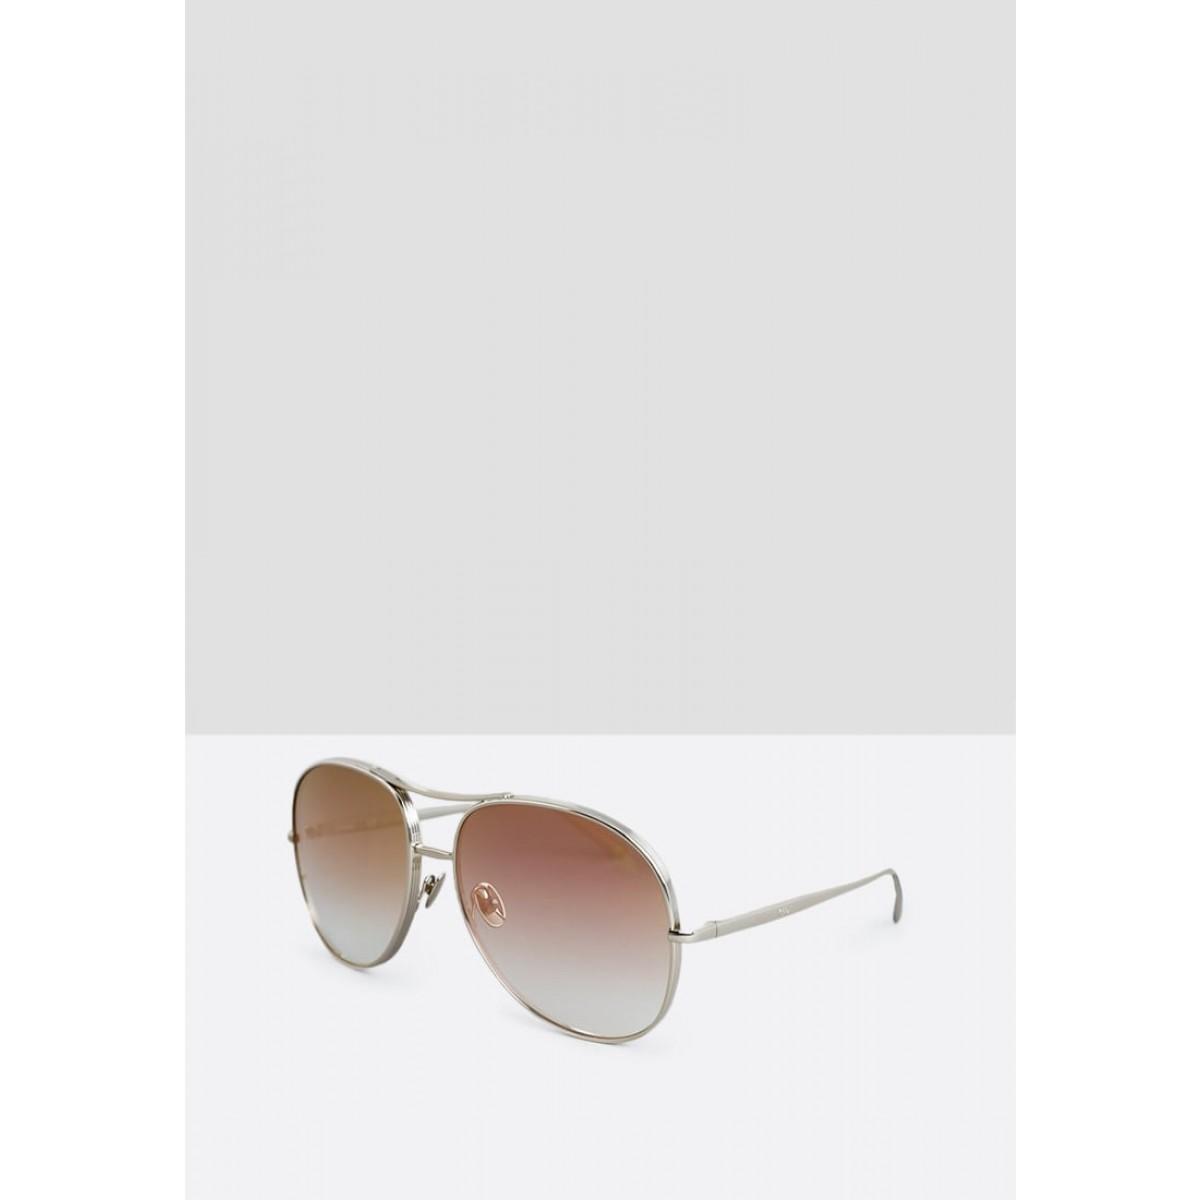 023ca56655e Chloe Jayme Rose Gold Aviator Women Sunglasses Cl-Ce127s-778-61 ...